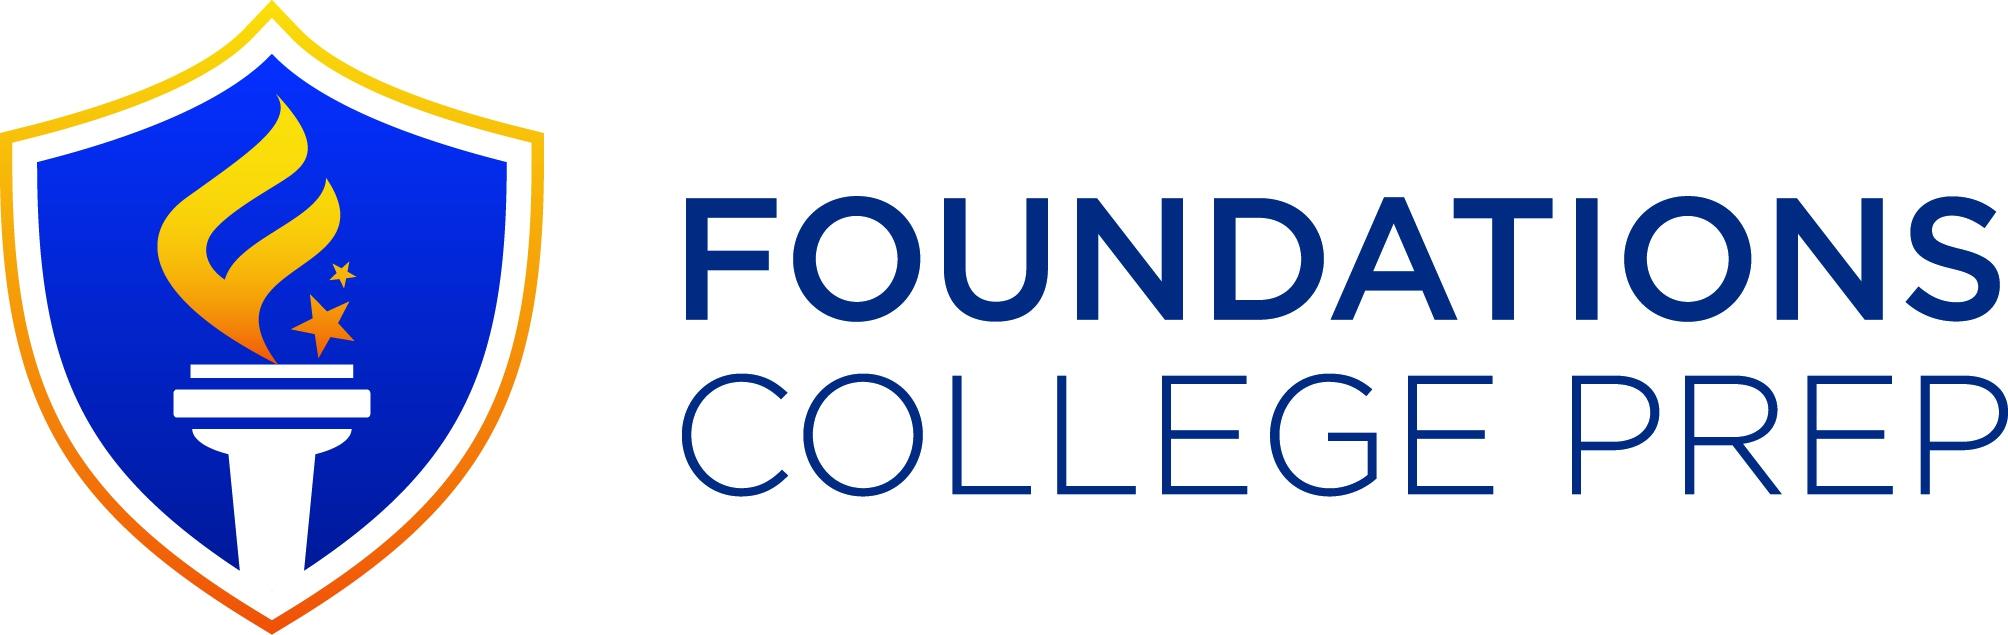 Foundations College Prep Logo